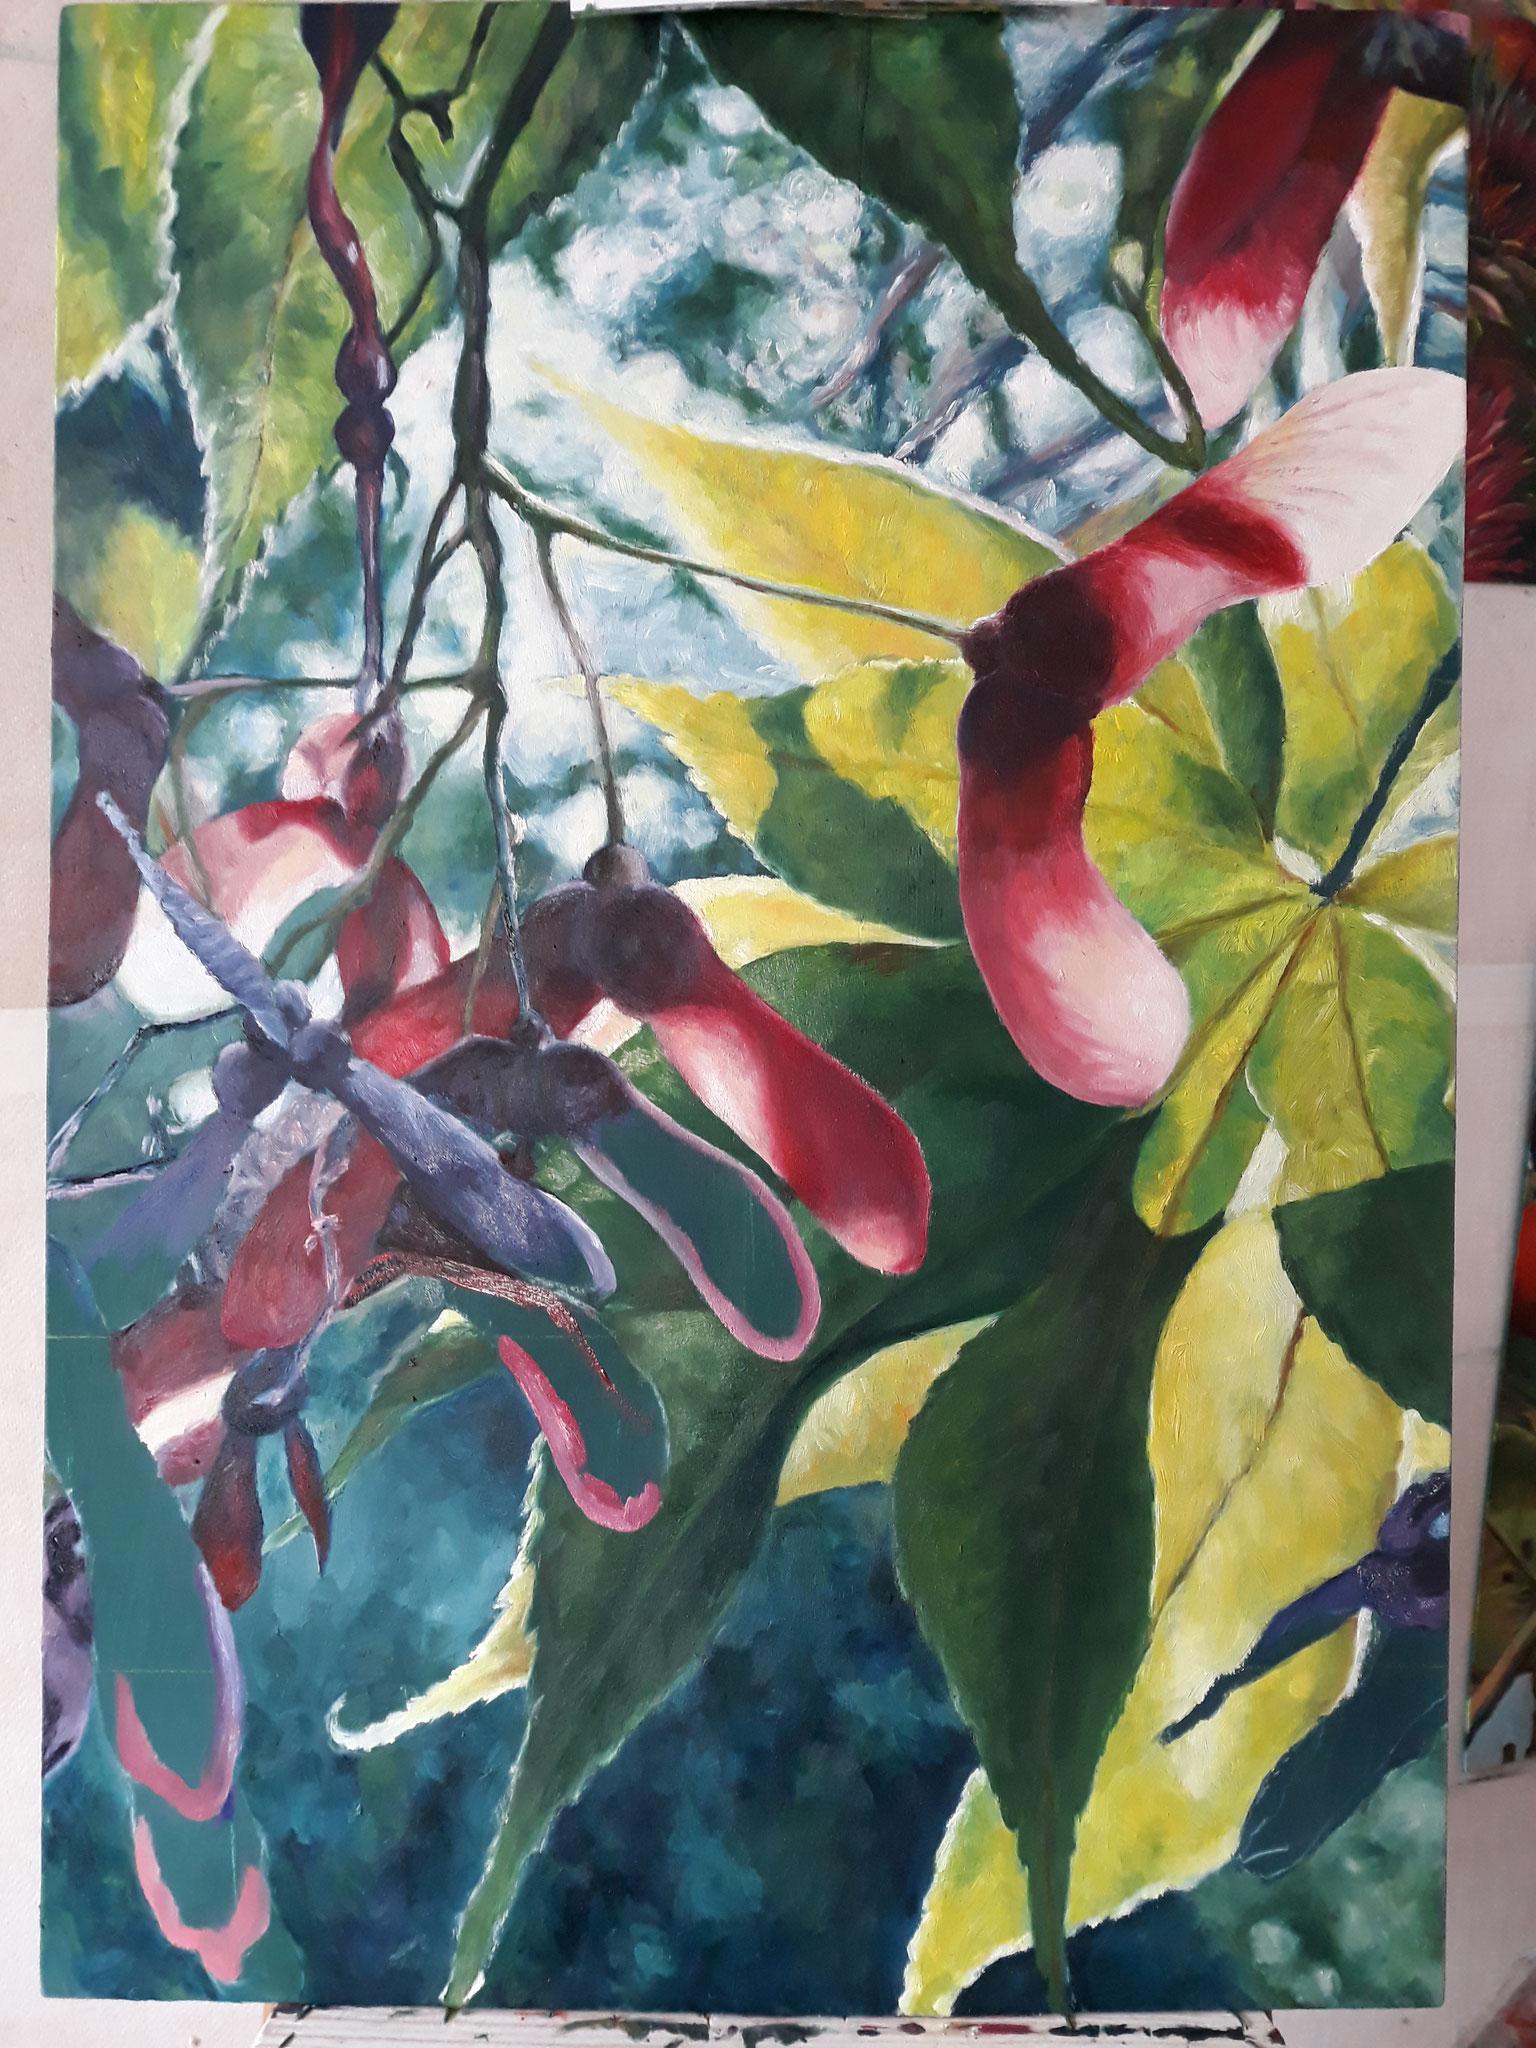 Ahorn, frau jenson 2019, Ölmalerei auf Holz